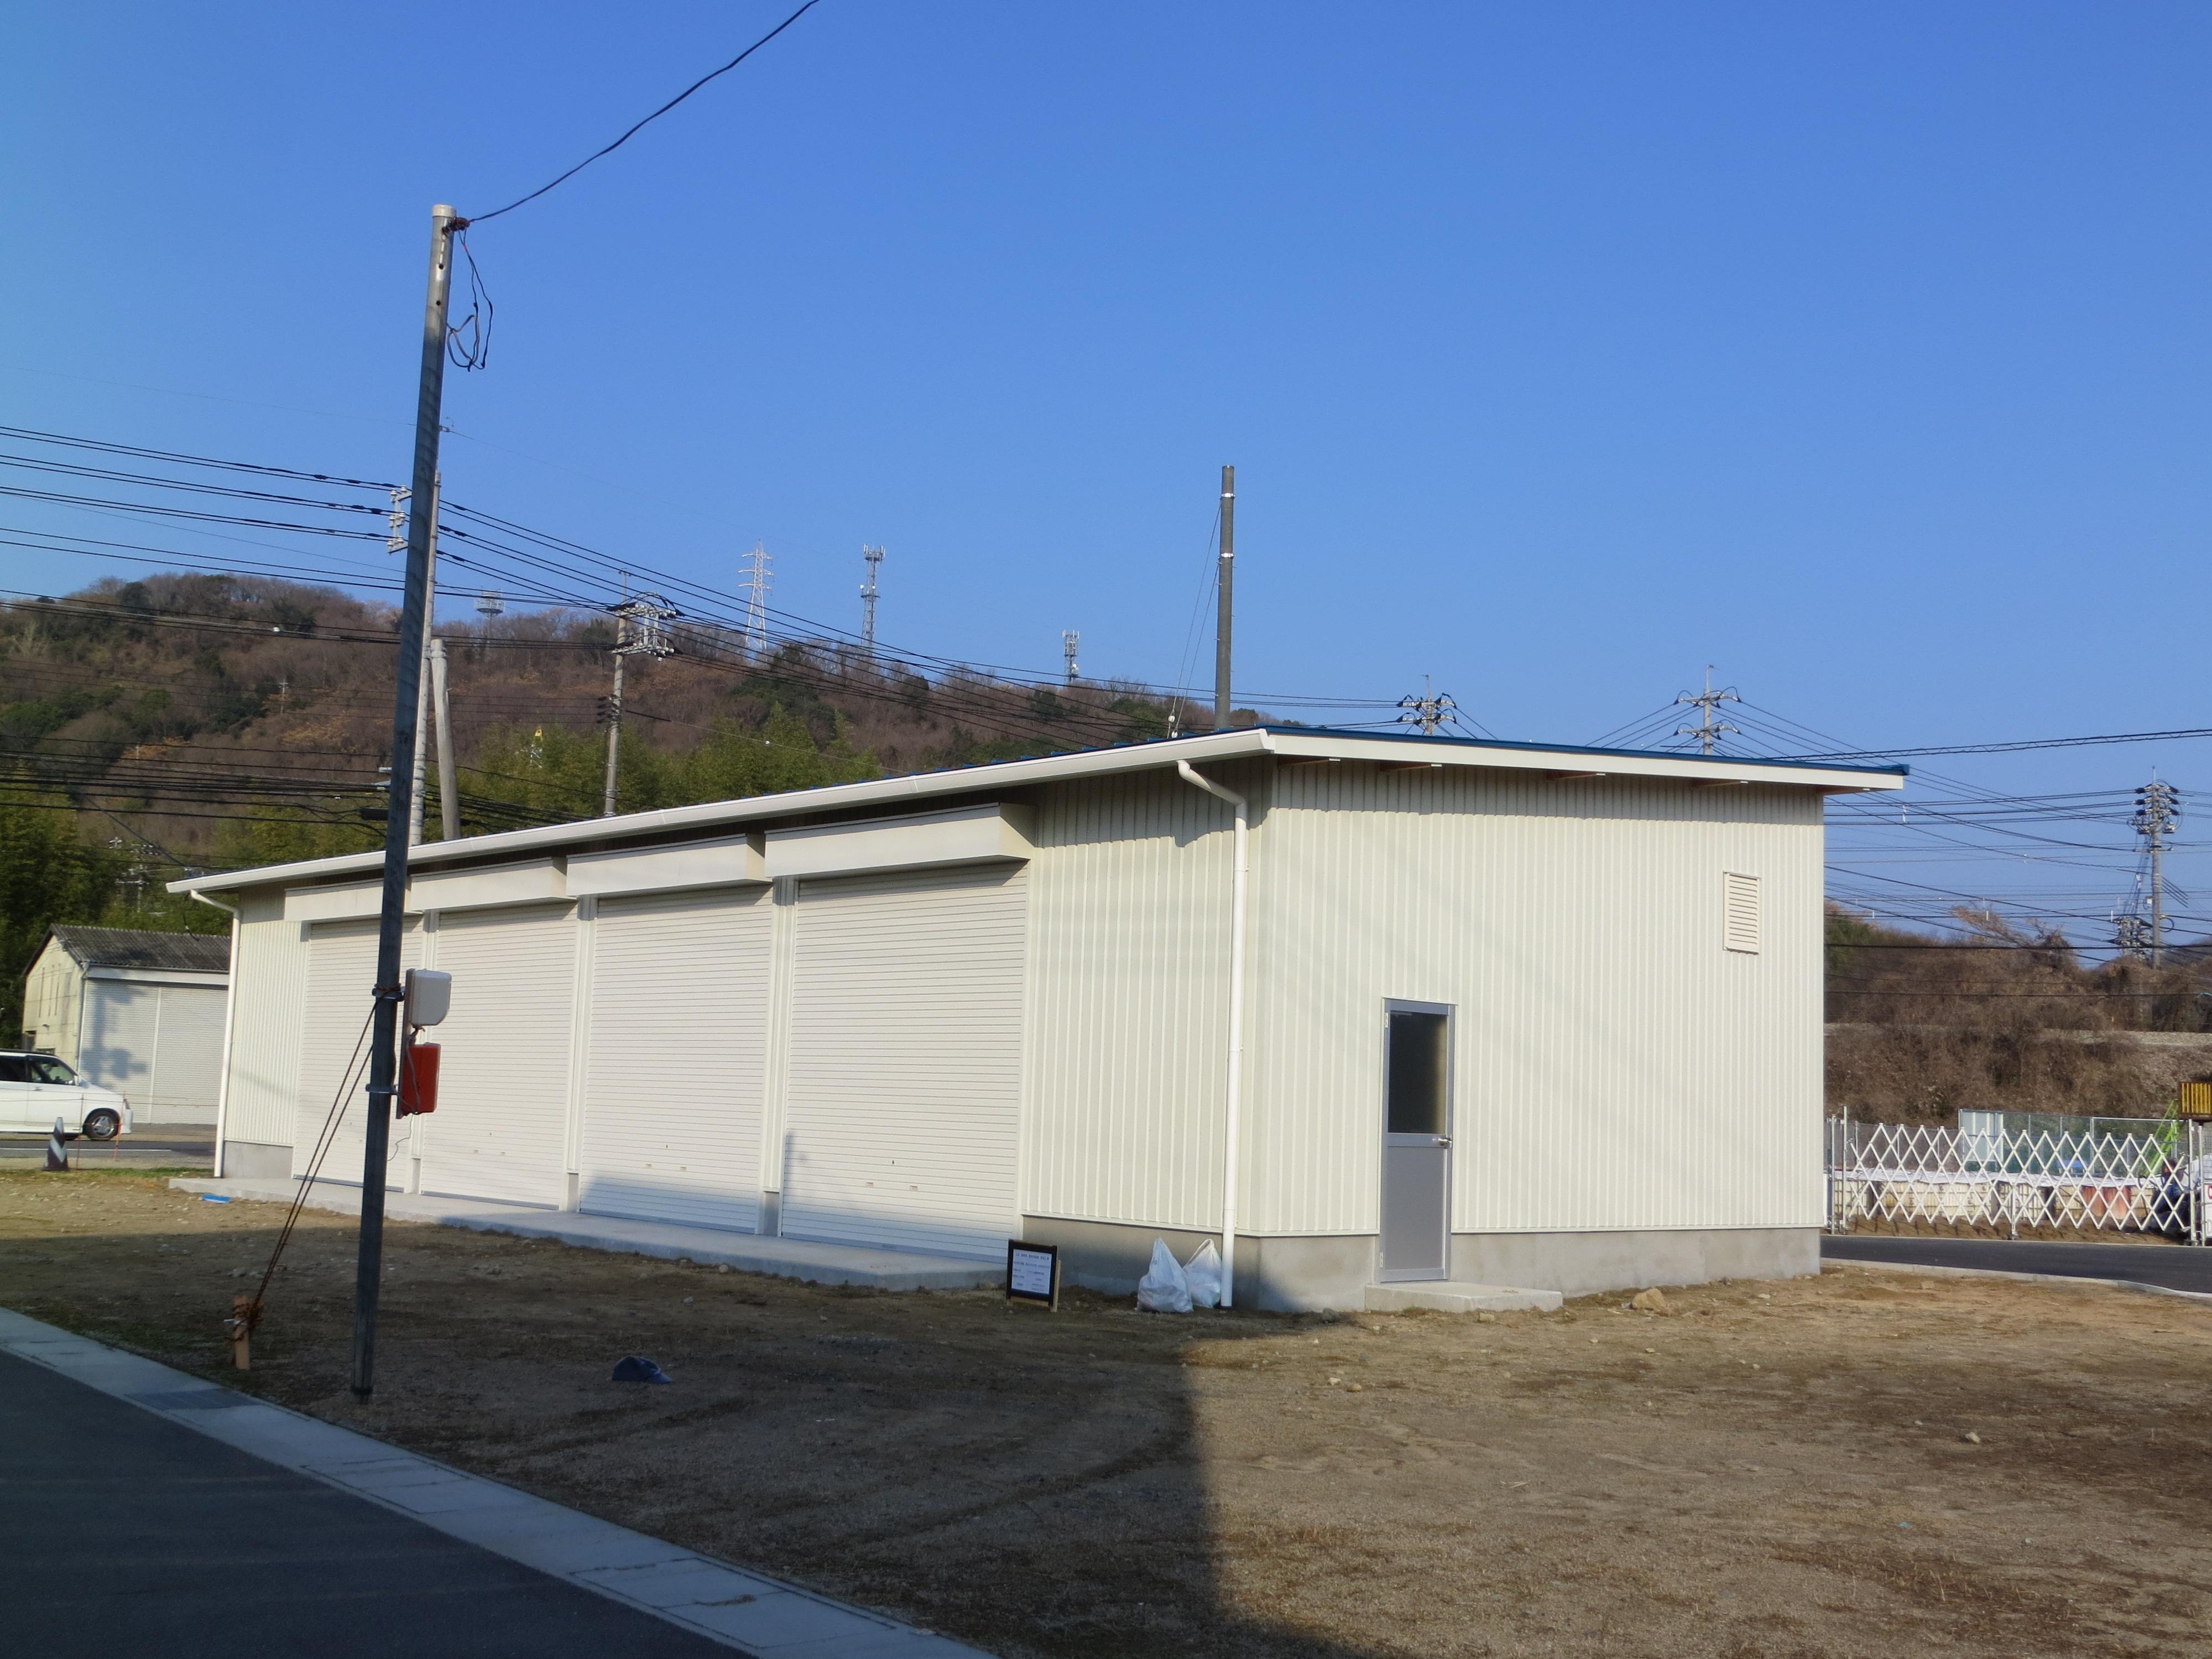 http://www.t-ueda.jp/myblog/IMG_3236.JPG